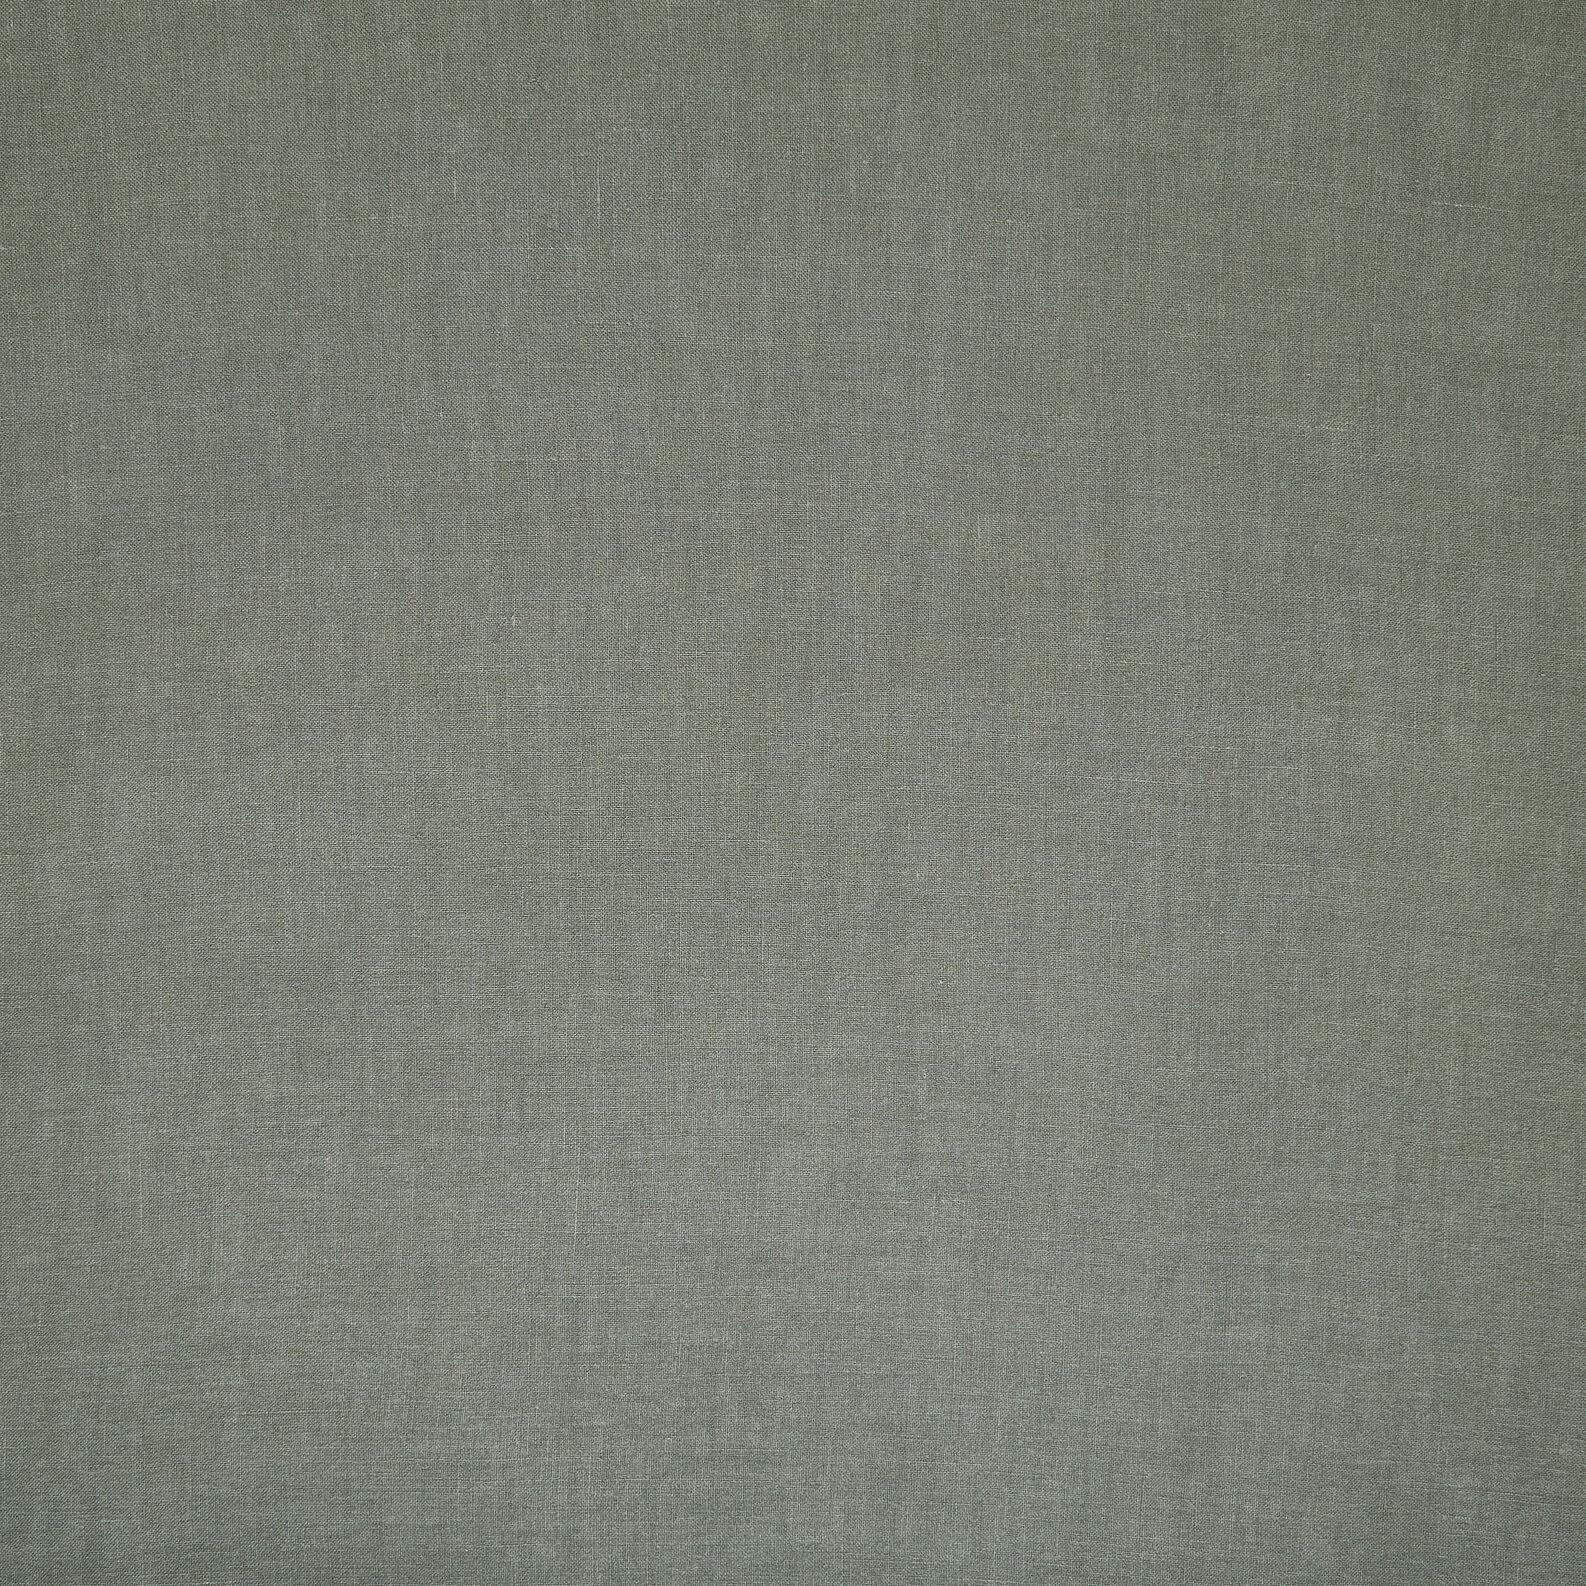 Solid colour 100% linen bedspread